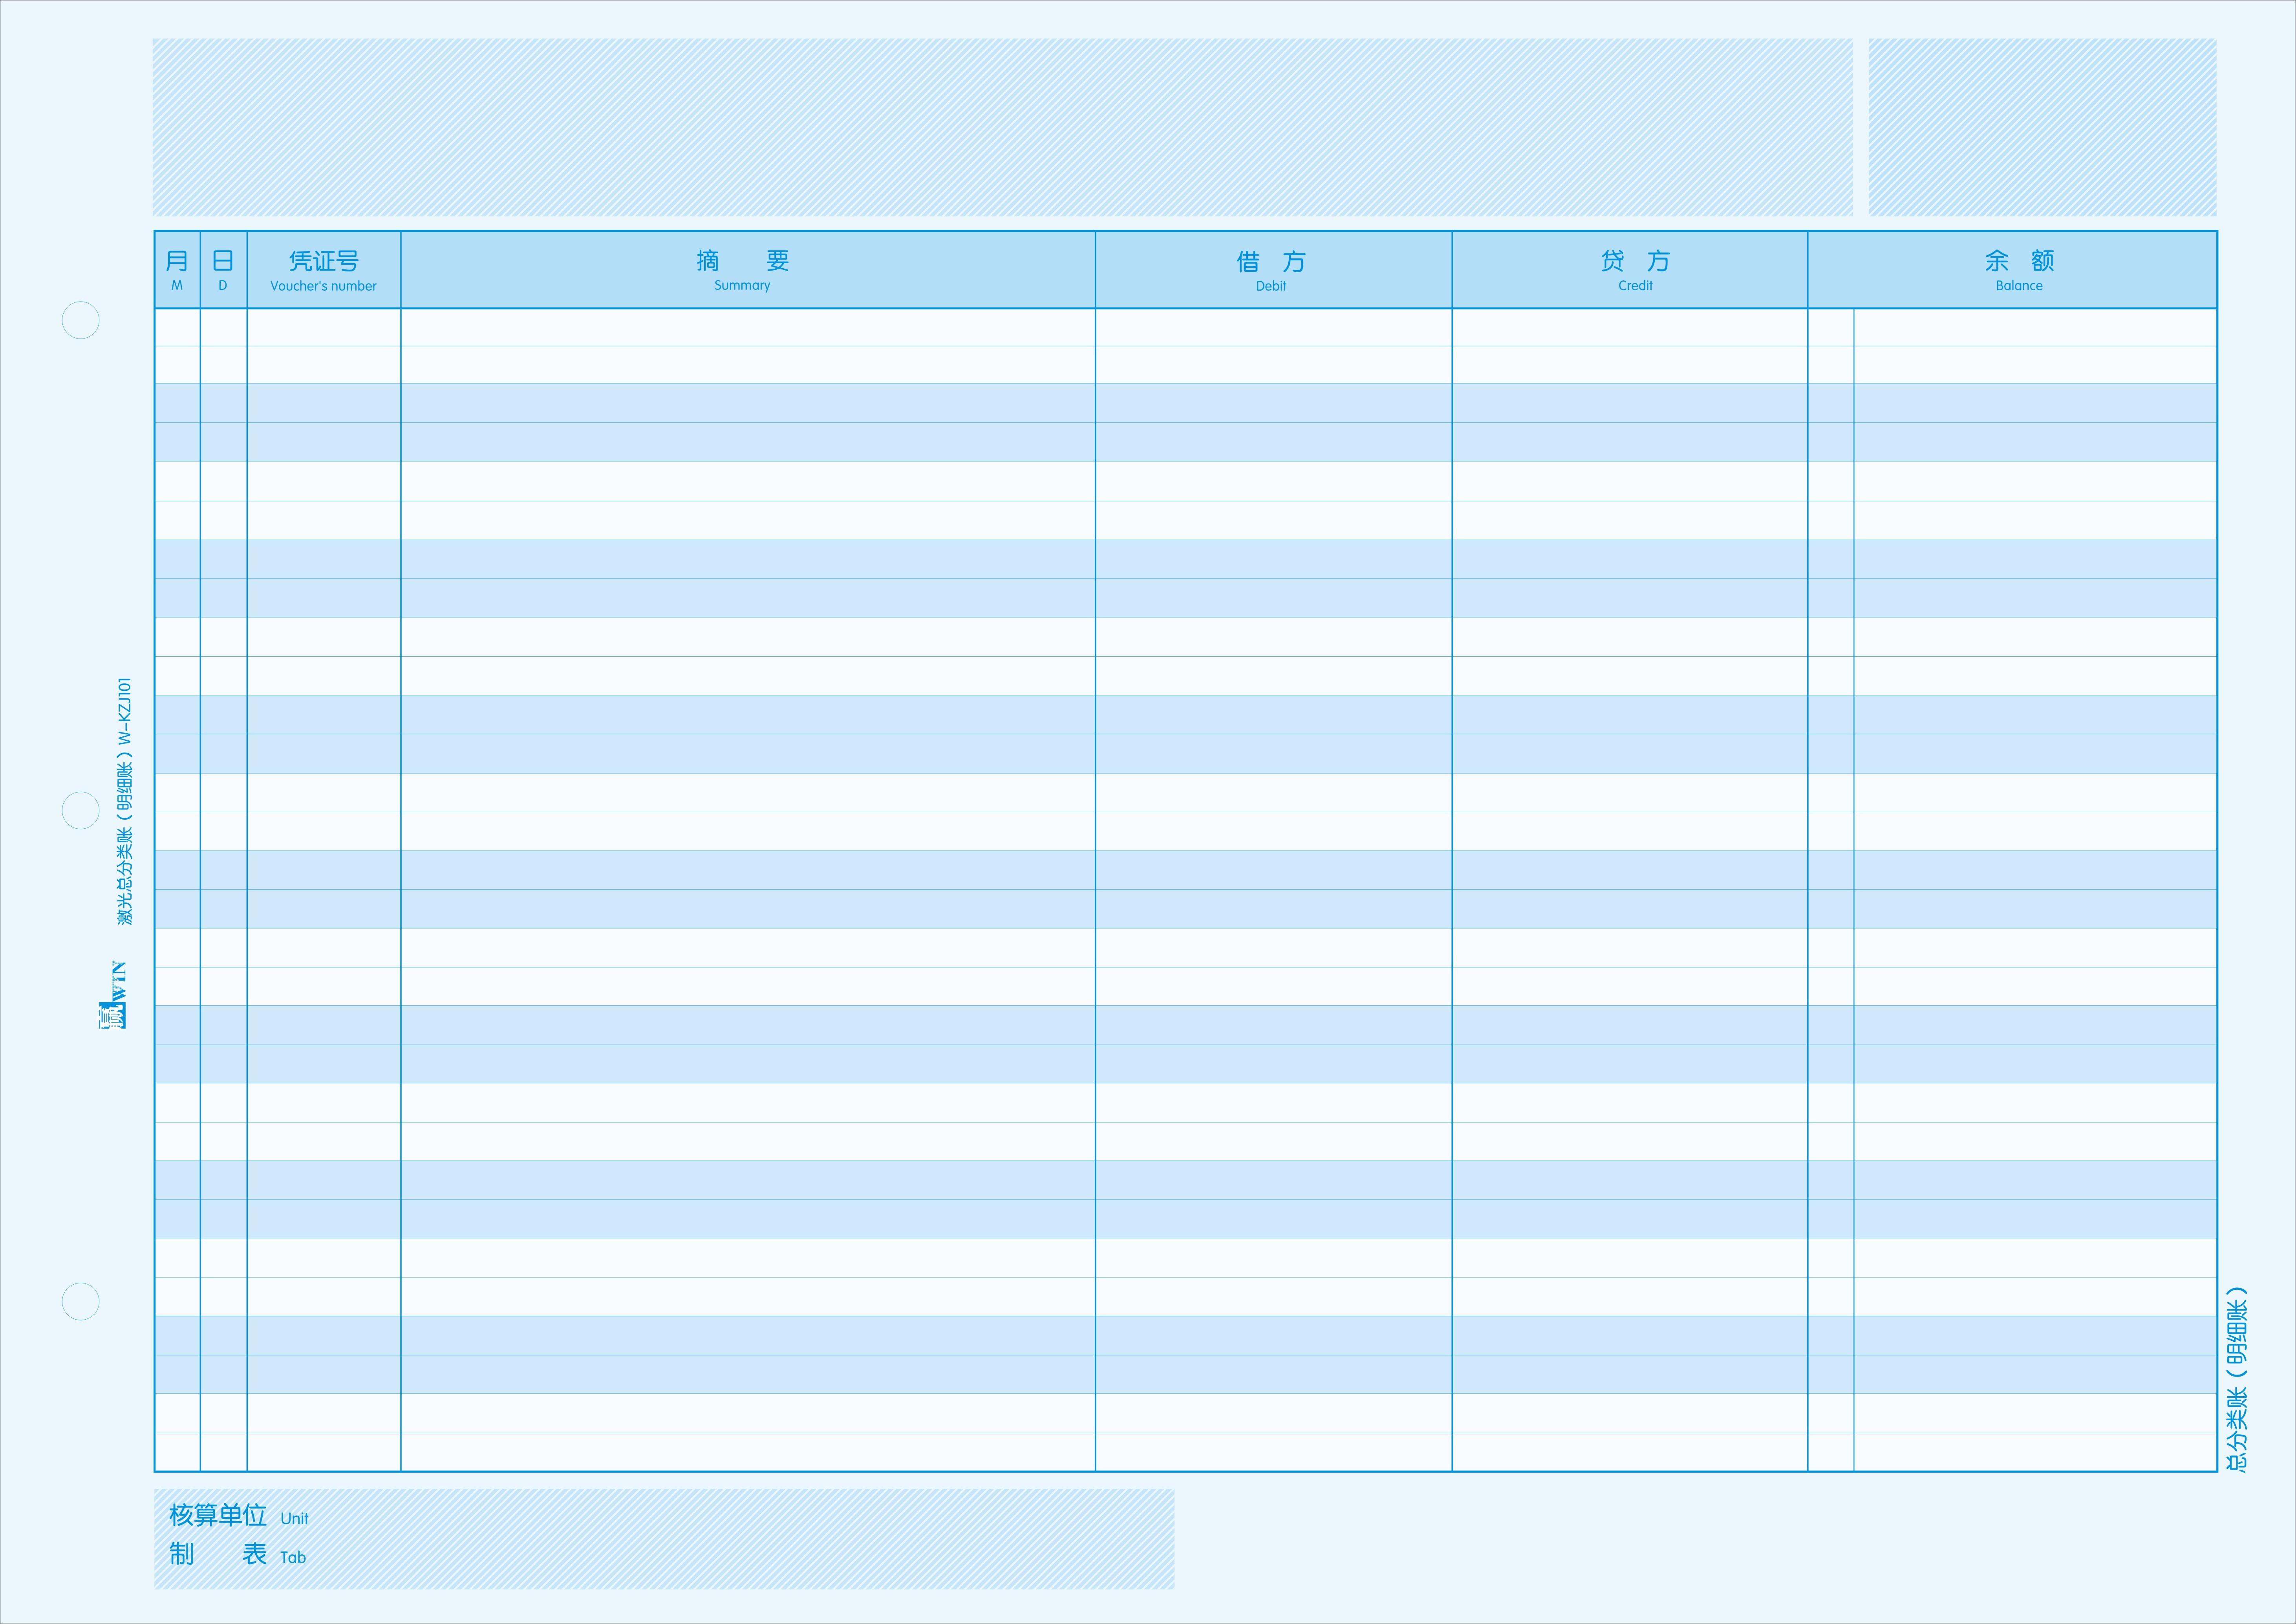 U8-A4激光账页-总分类账-明细账平张061103-4